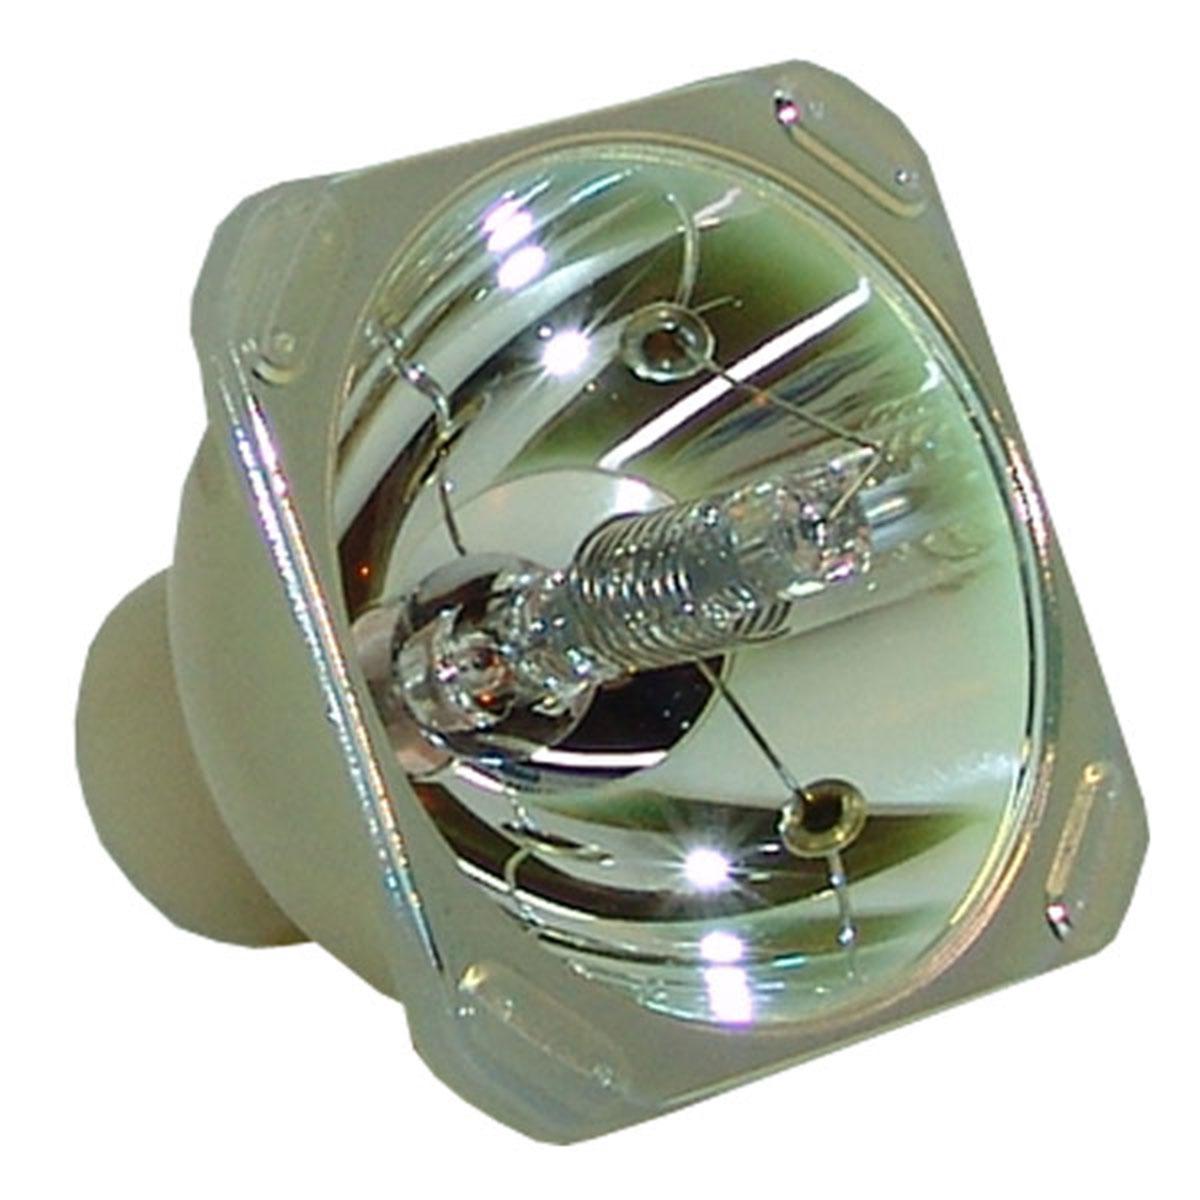 Original Osram Projector Lamp Replacement for Delta DP3616LAMP (Bulb Only) - image 2 de 5